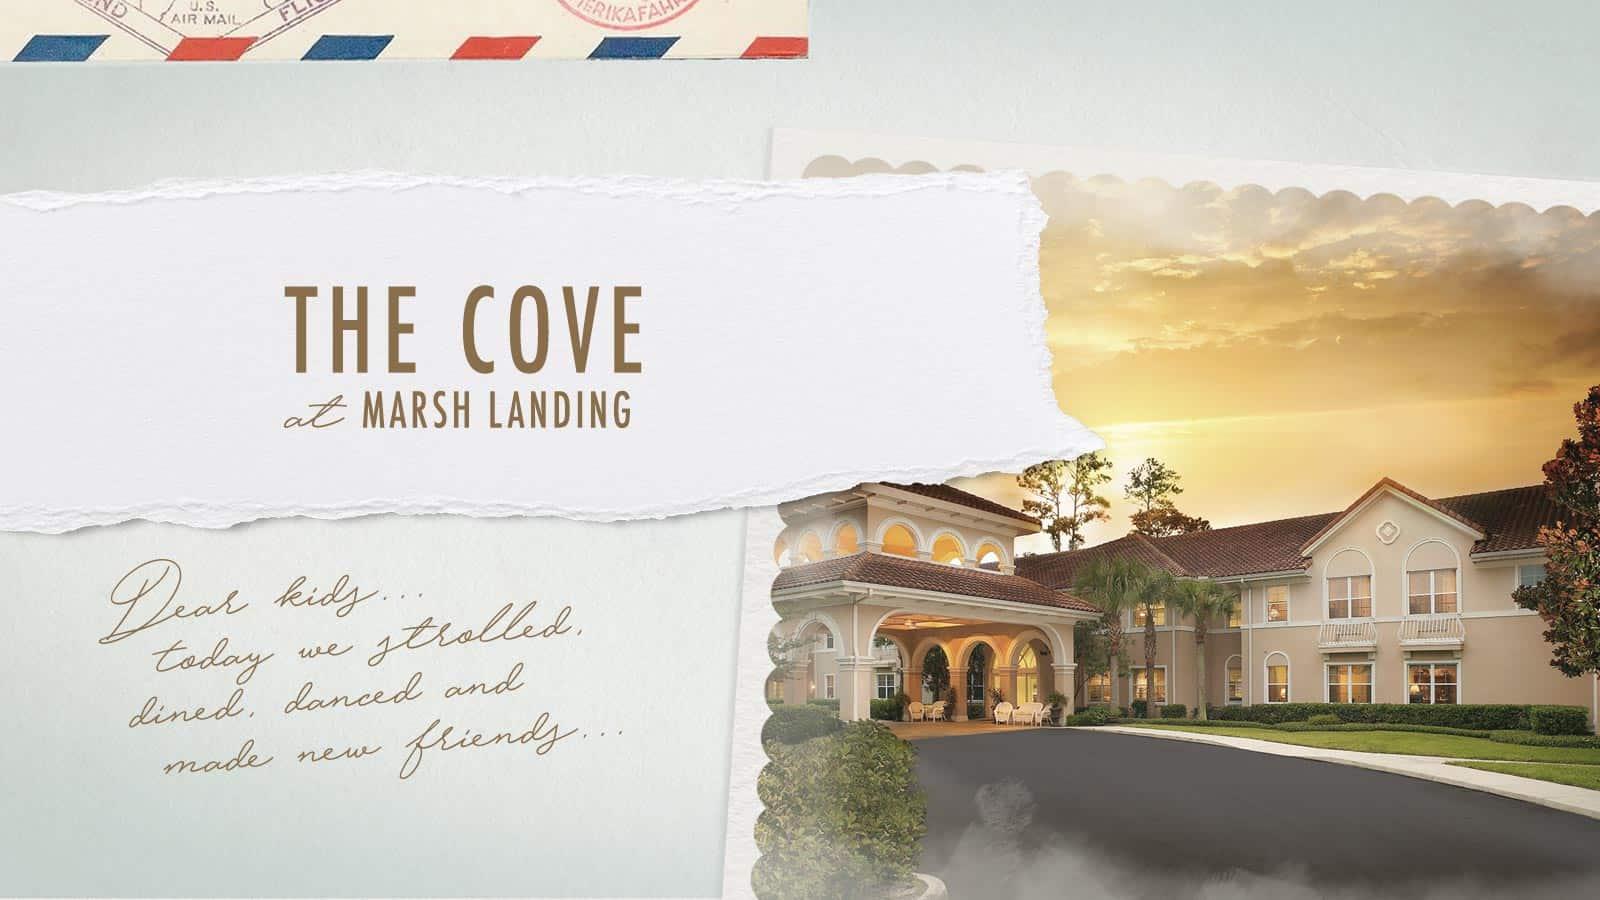 The Cove at Marsh Landing